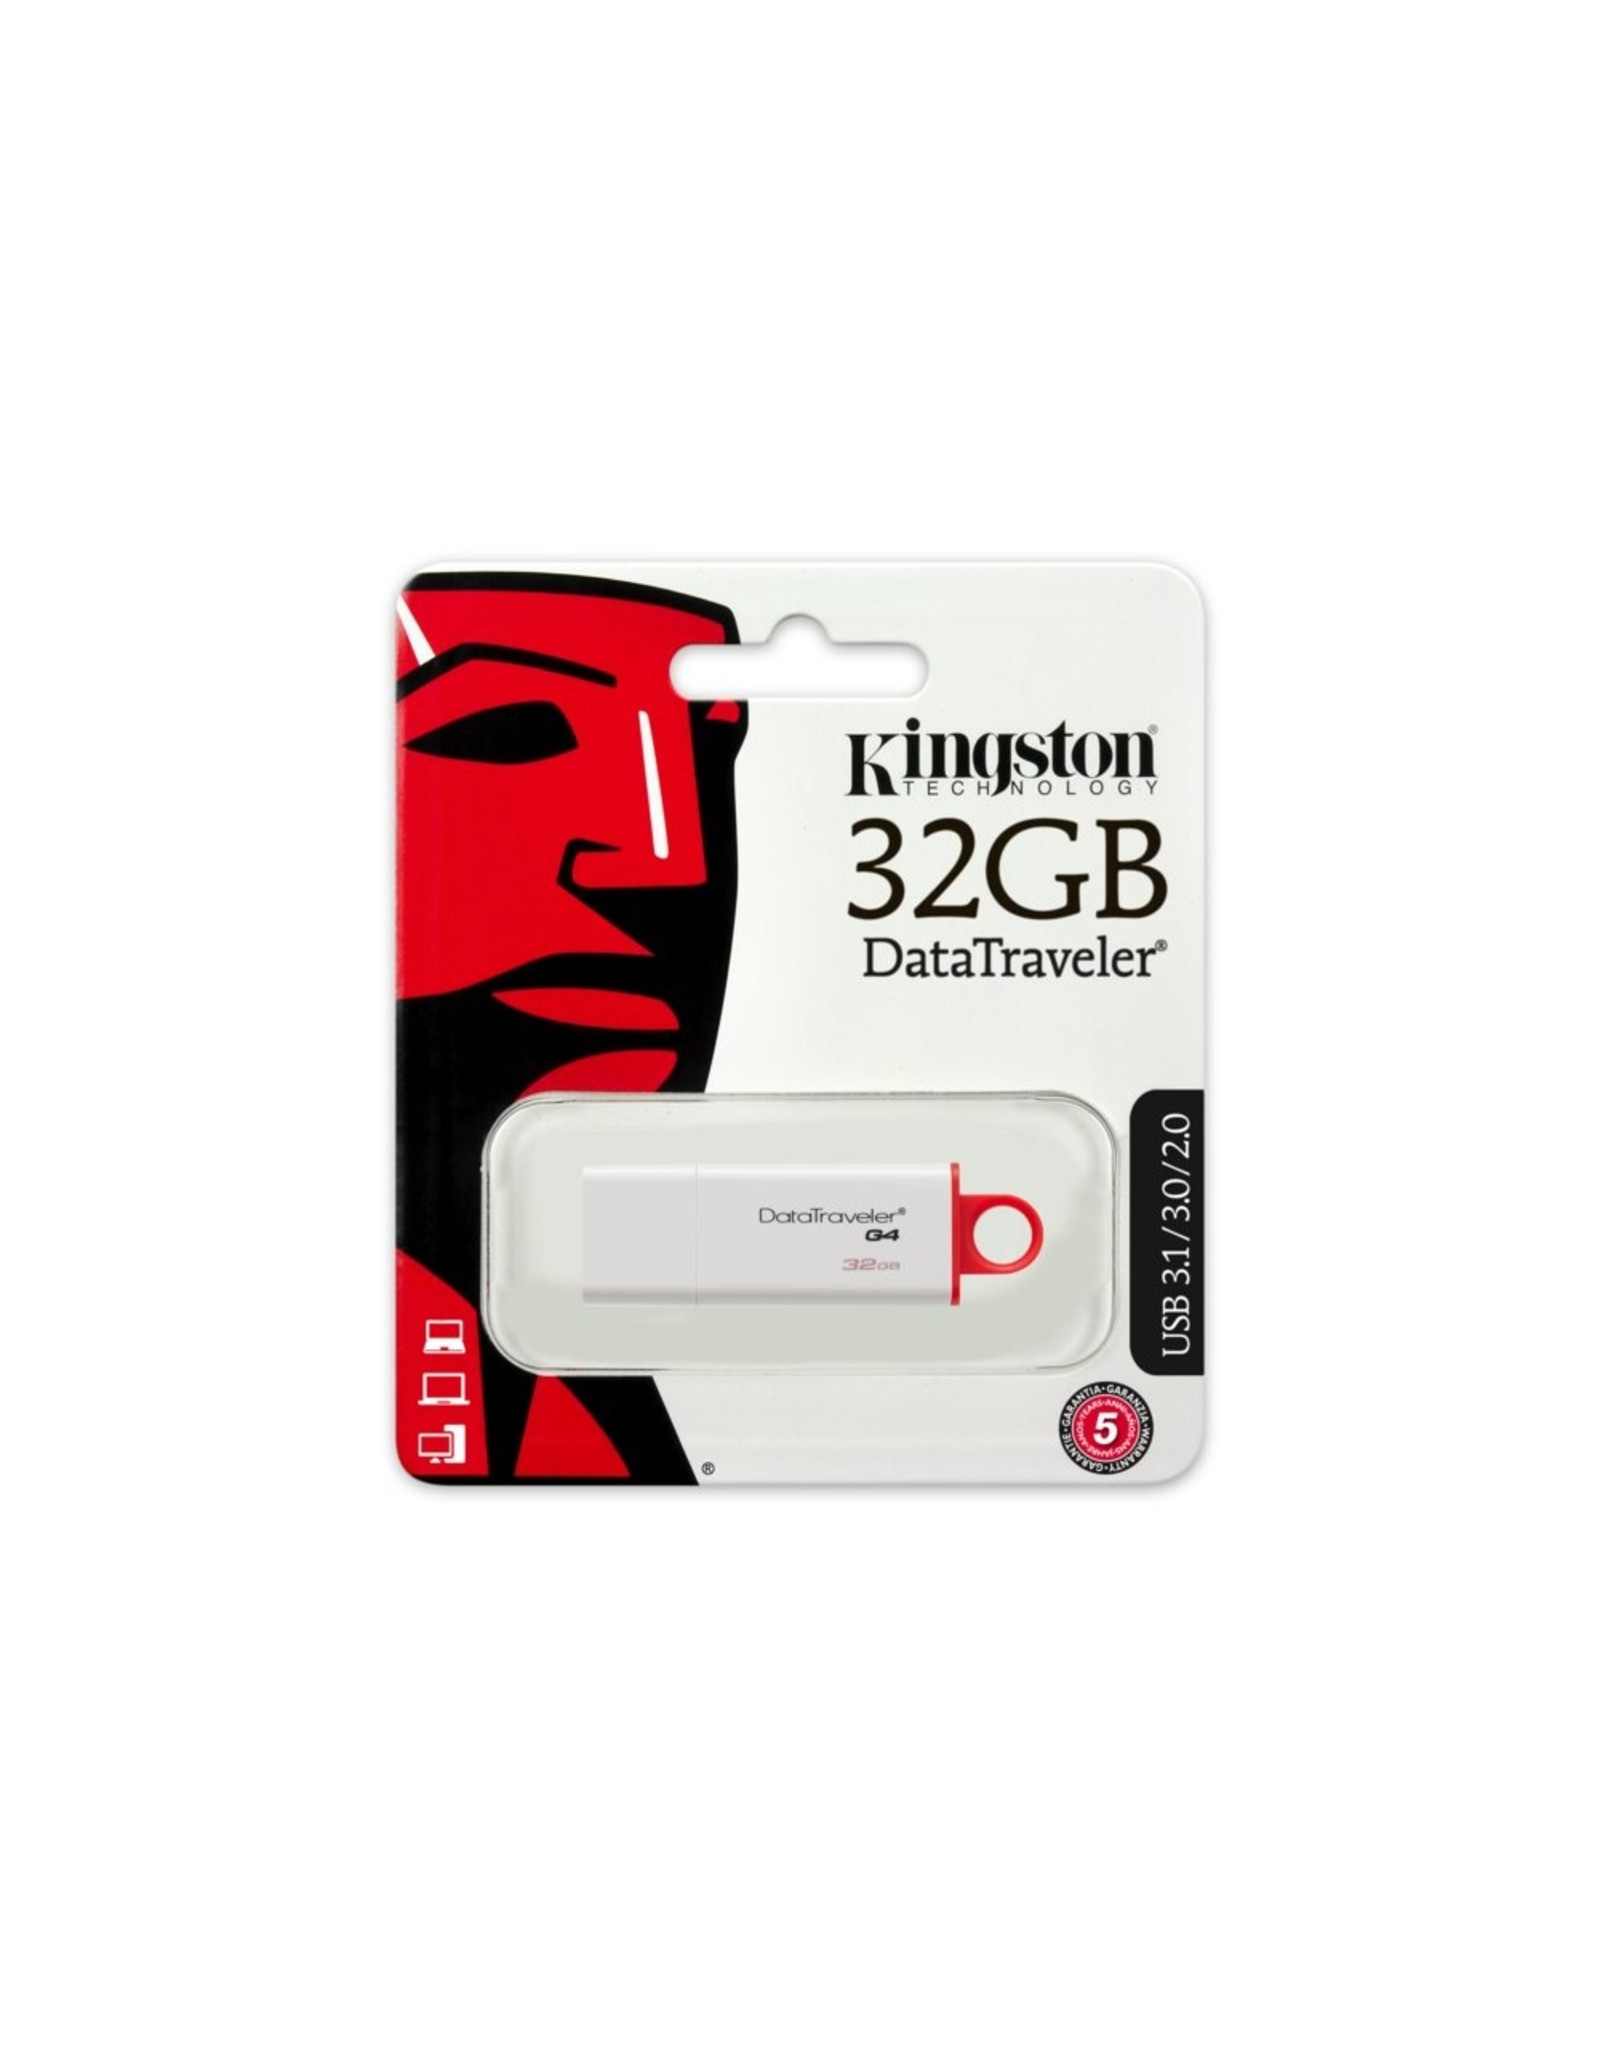 Kingston Storage  DataTraveler 32GB USB3.0 Gen4